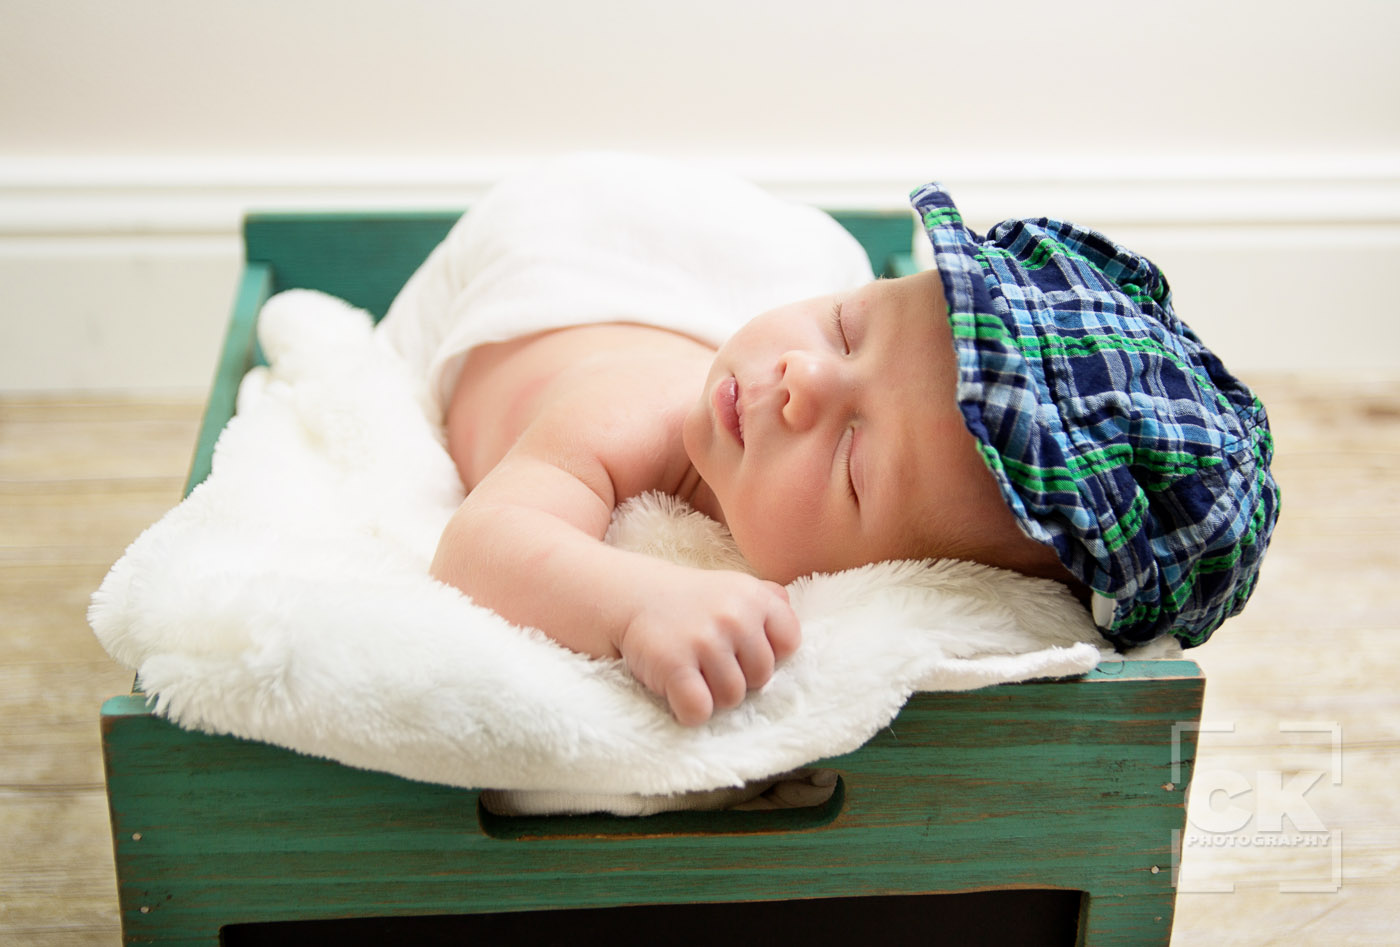 Chris Kryzanek Photography - newborn with cute hat